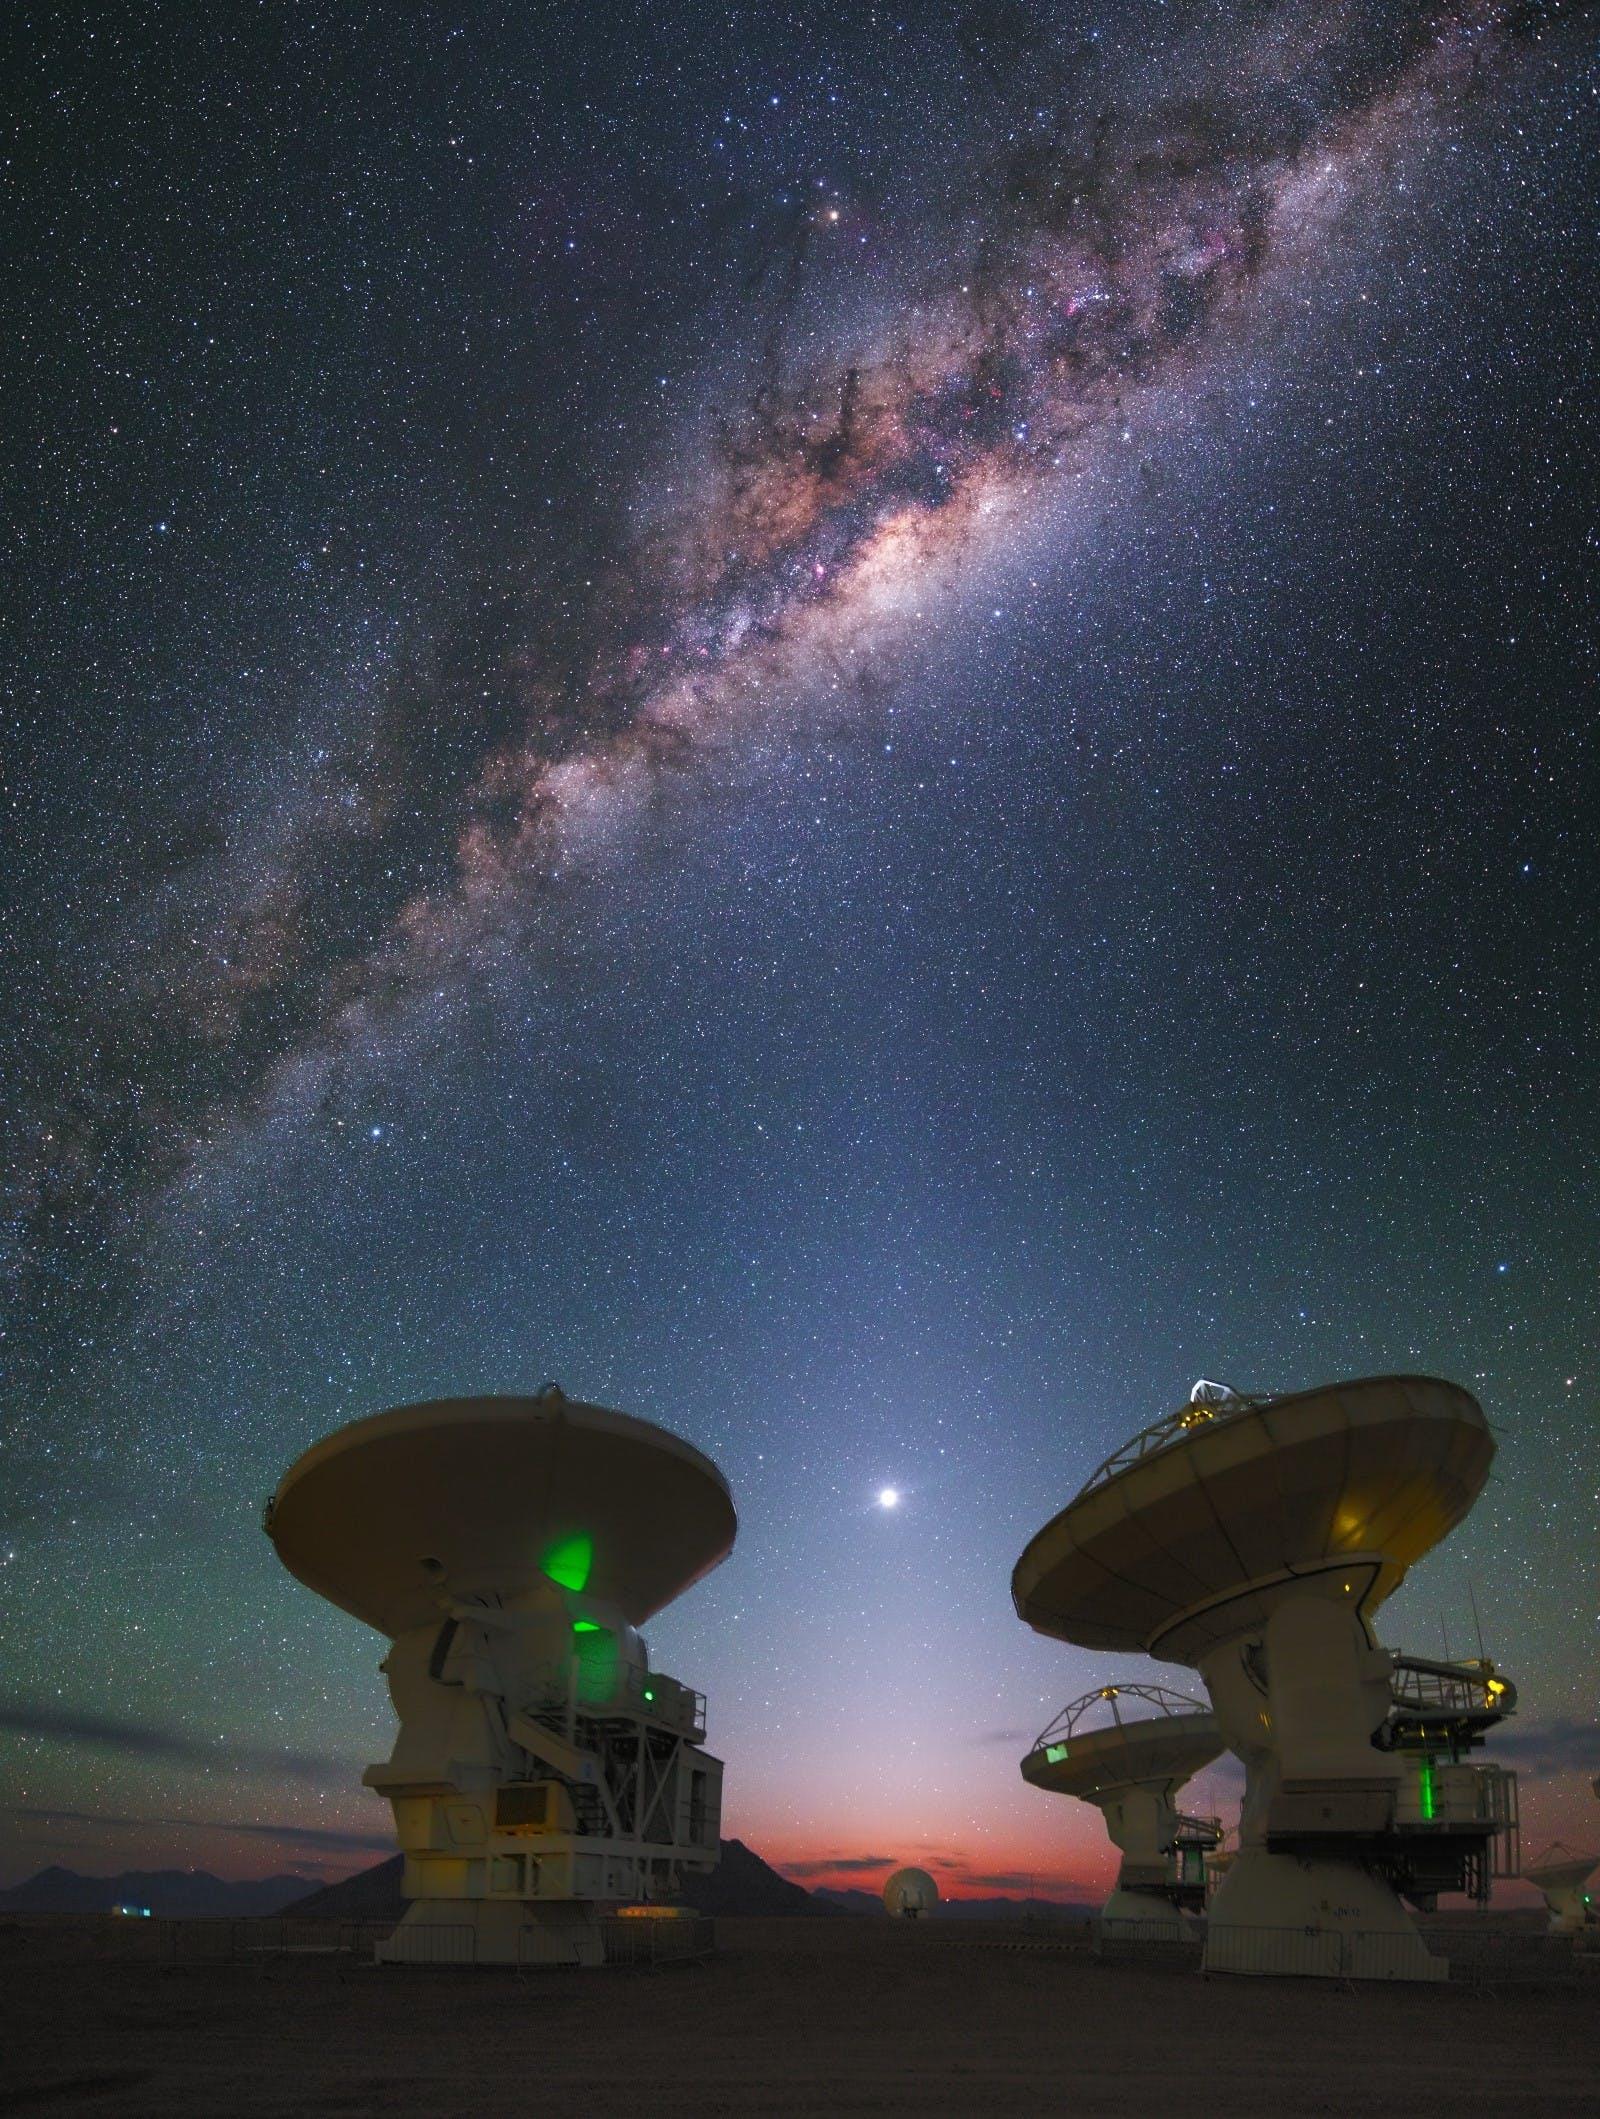 Night sky in the Atacama Desert, Chile